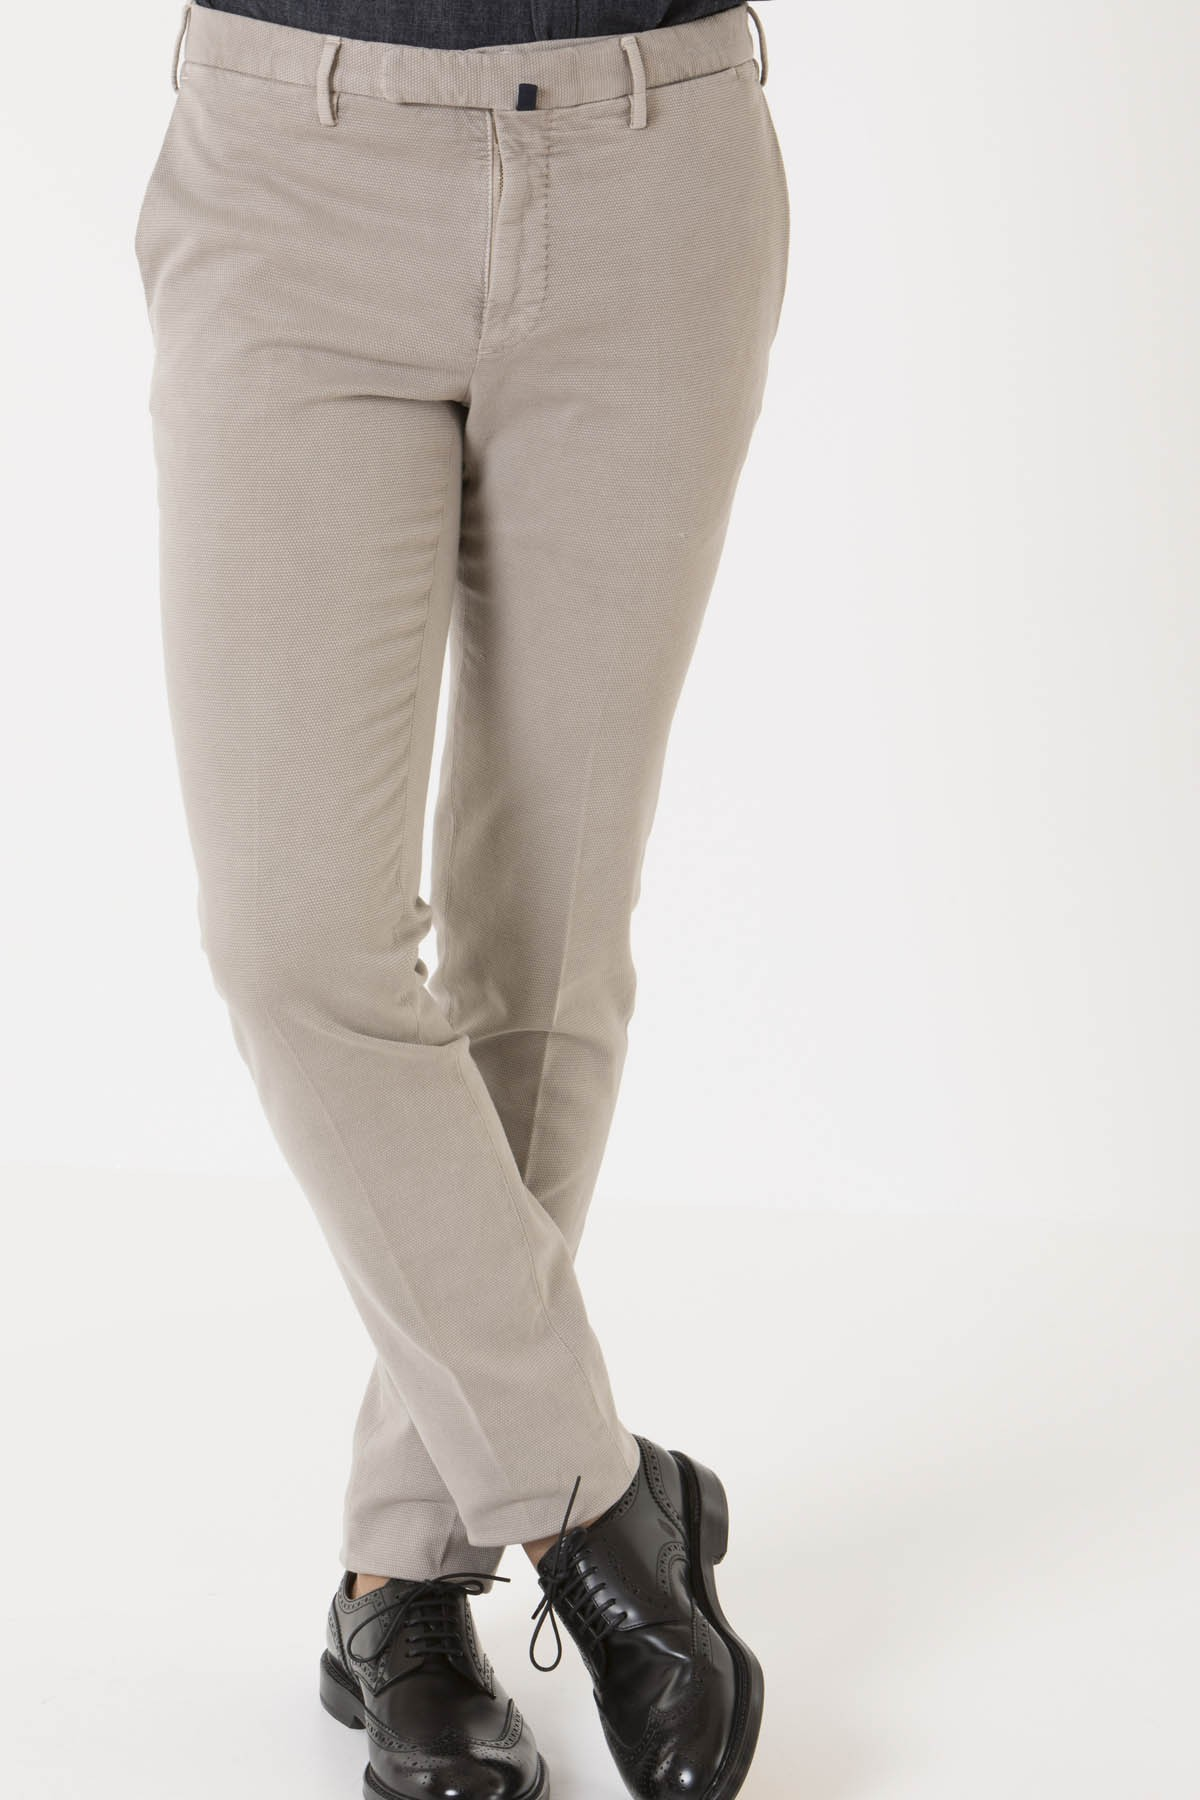 Pantaloni 18 Uomo Venezia Incotex 19 1951 Ai Per r6rnpRq